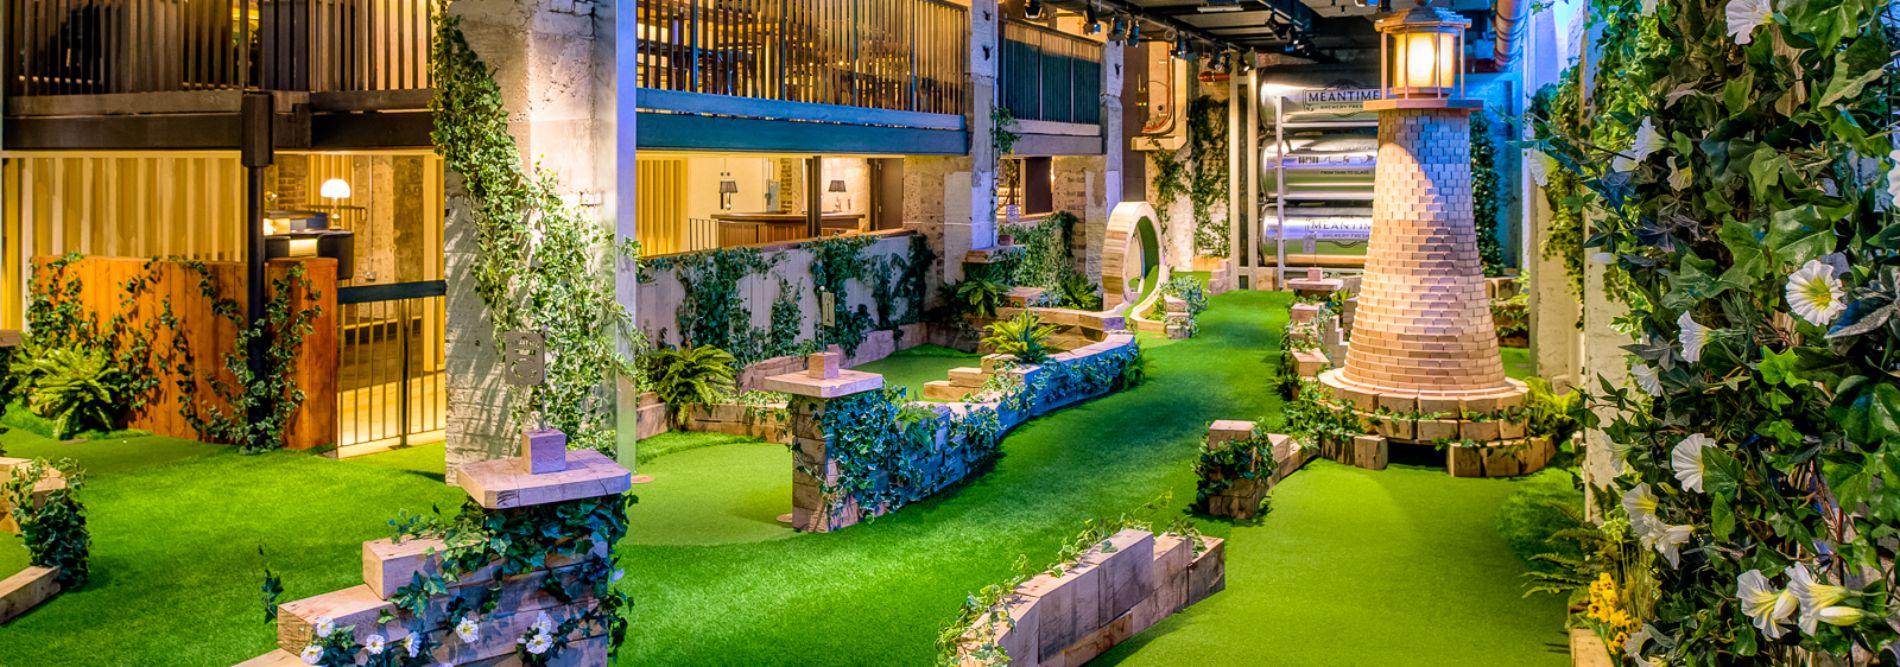 Swingers city crazy golf course